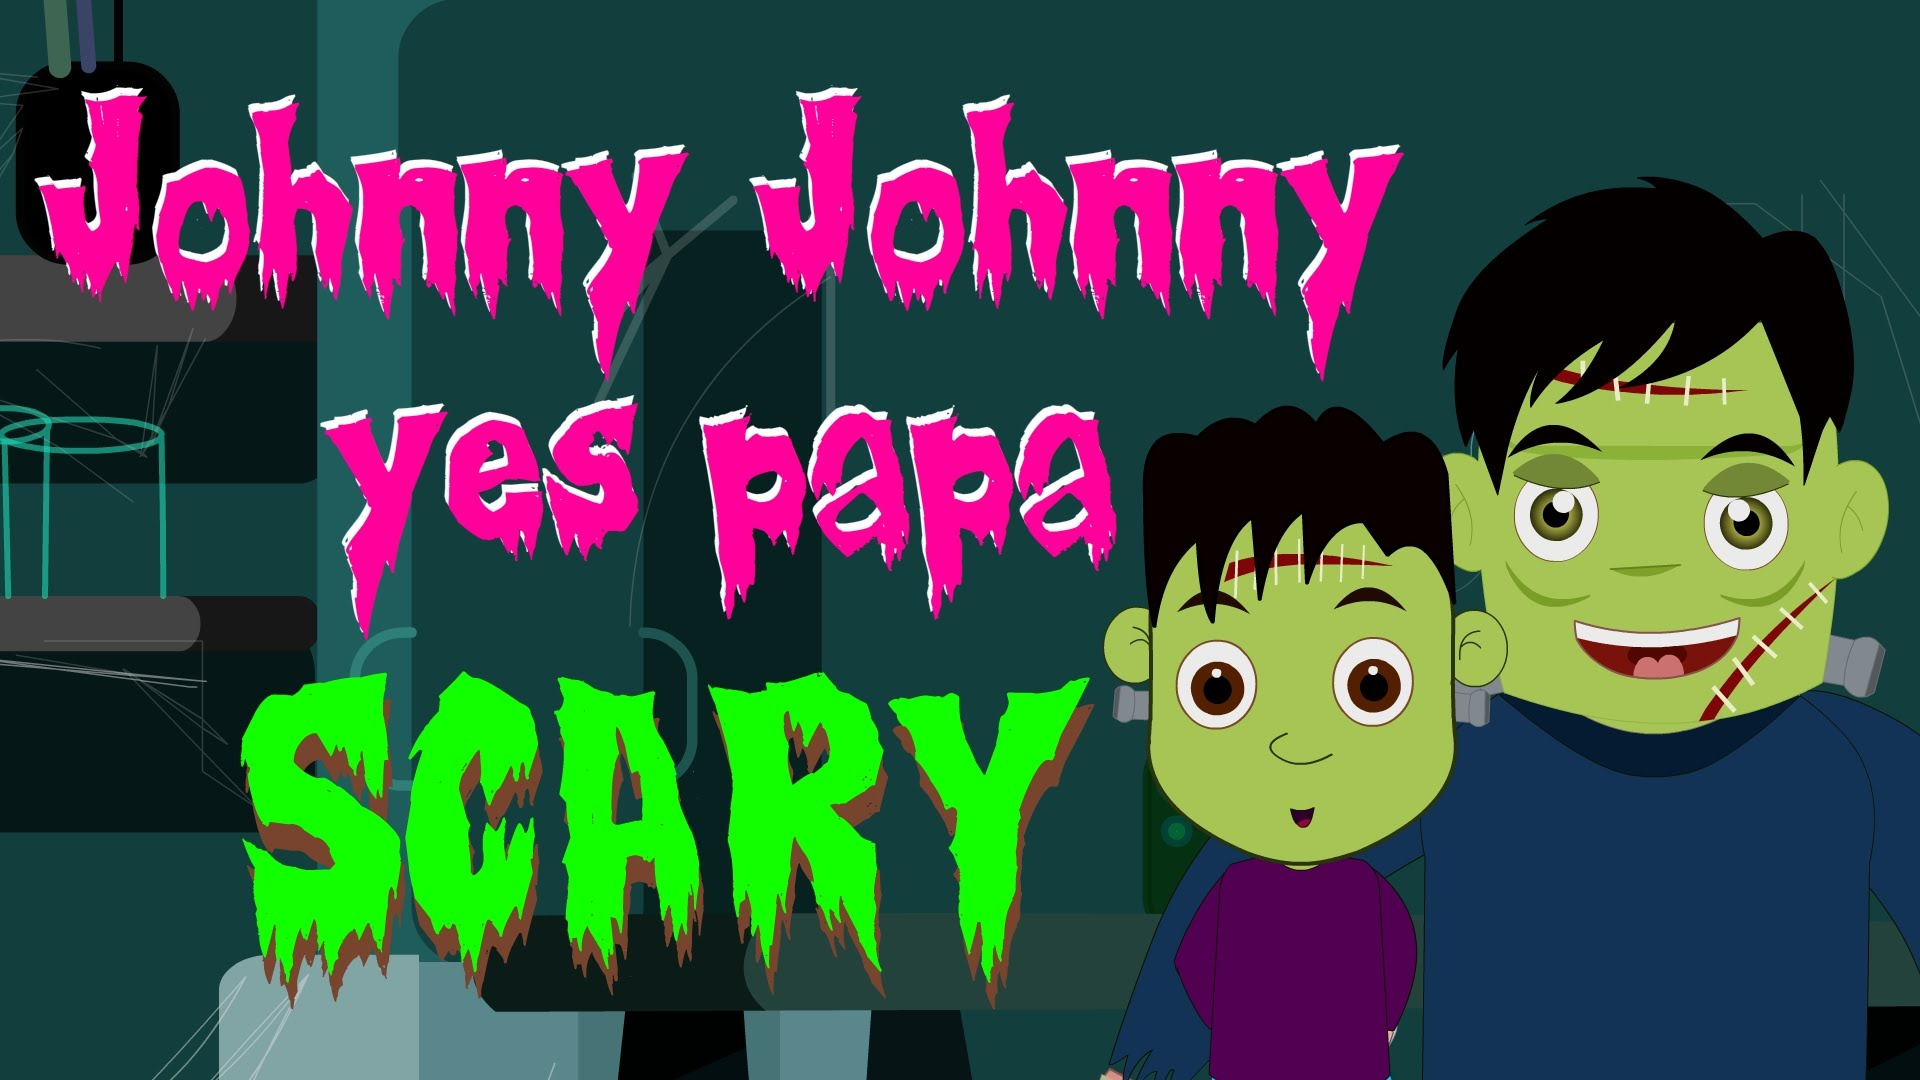 Johnny Johnny Yes Papa | Scary Rhymes | Spooky Nursey Rhymes | Halloween Rhymes